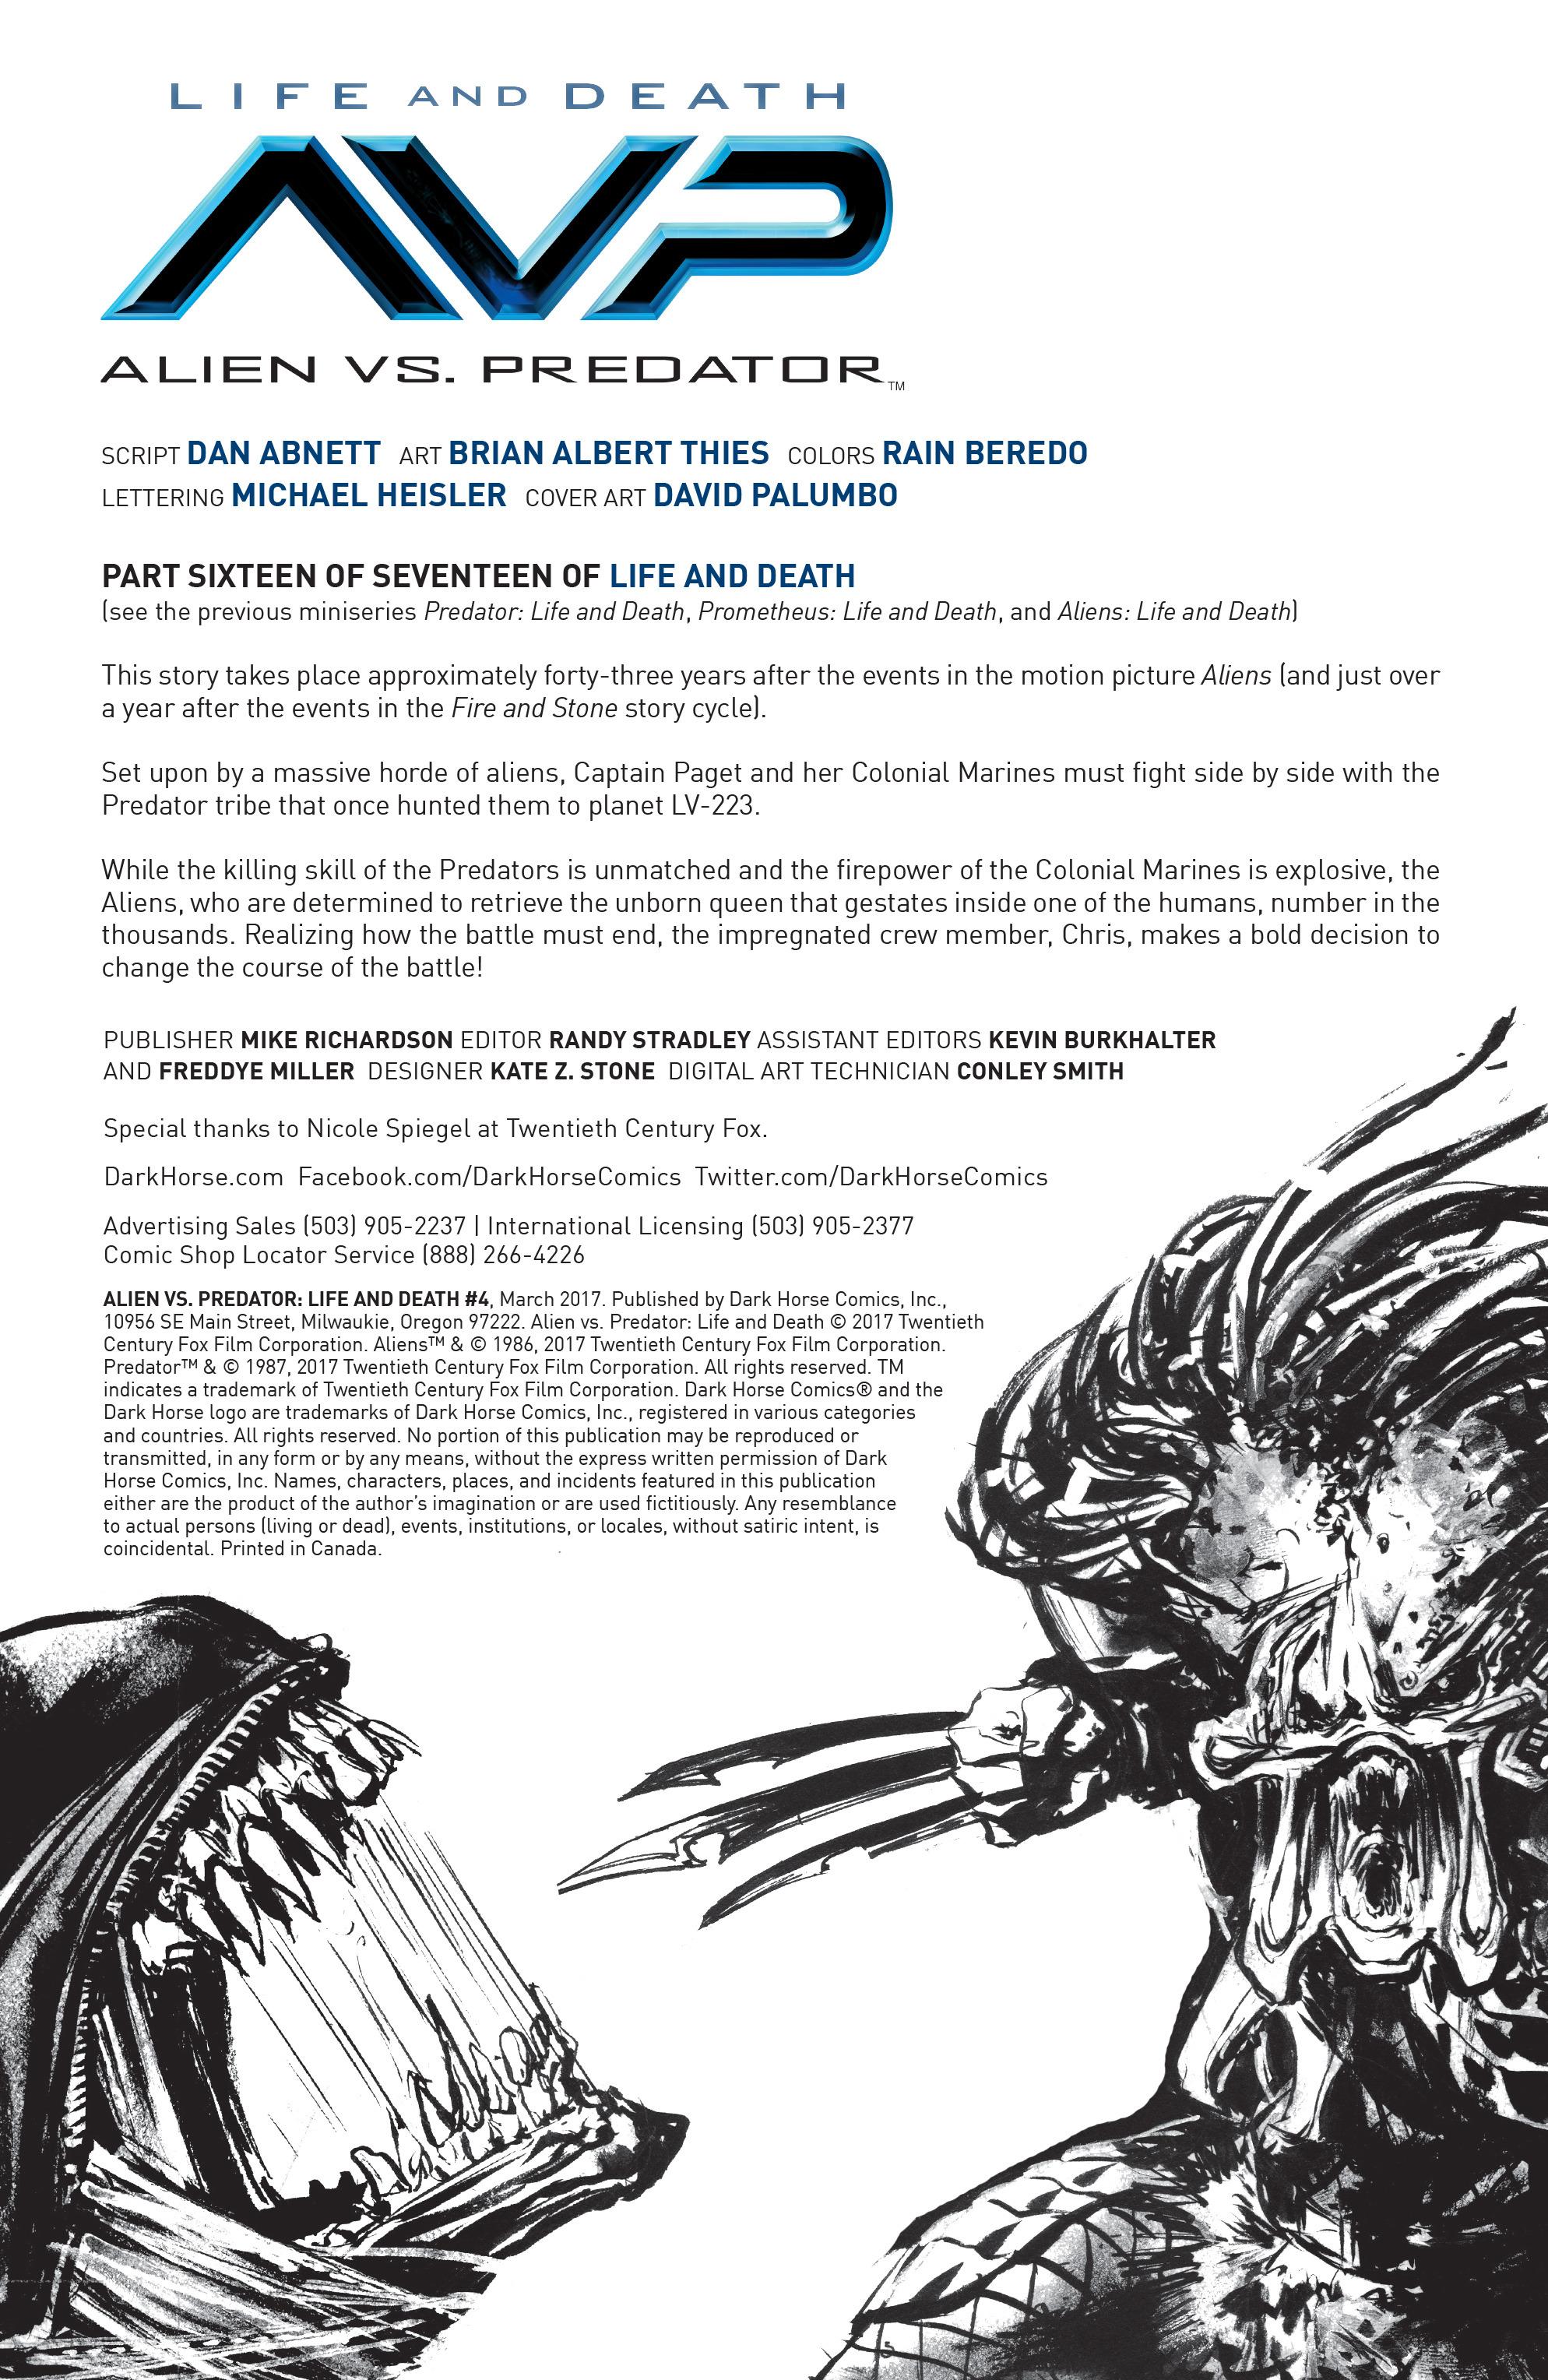 Read online Alien Vs. Predator: Life and Death comic -  Issue #4 - 2